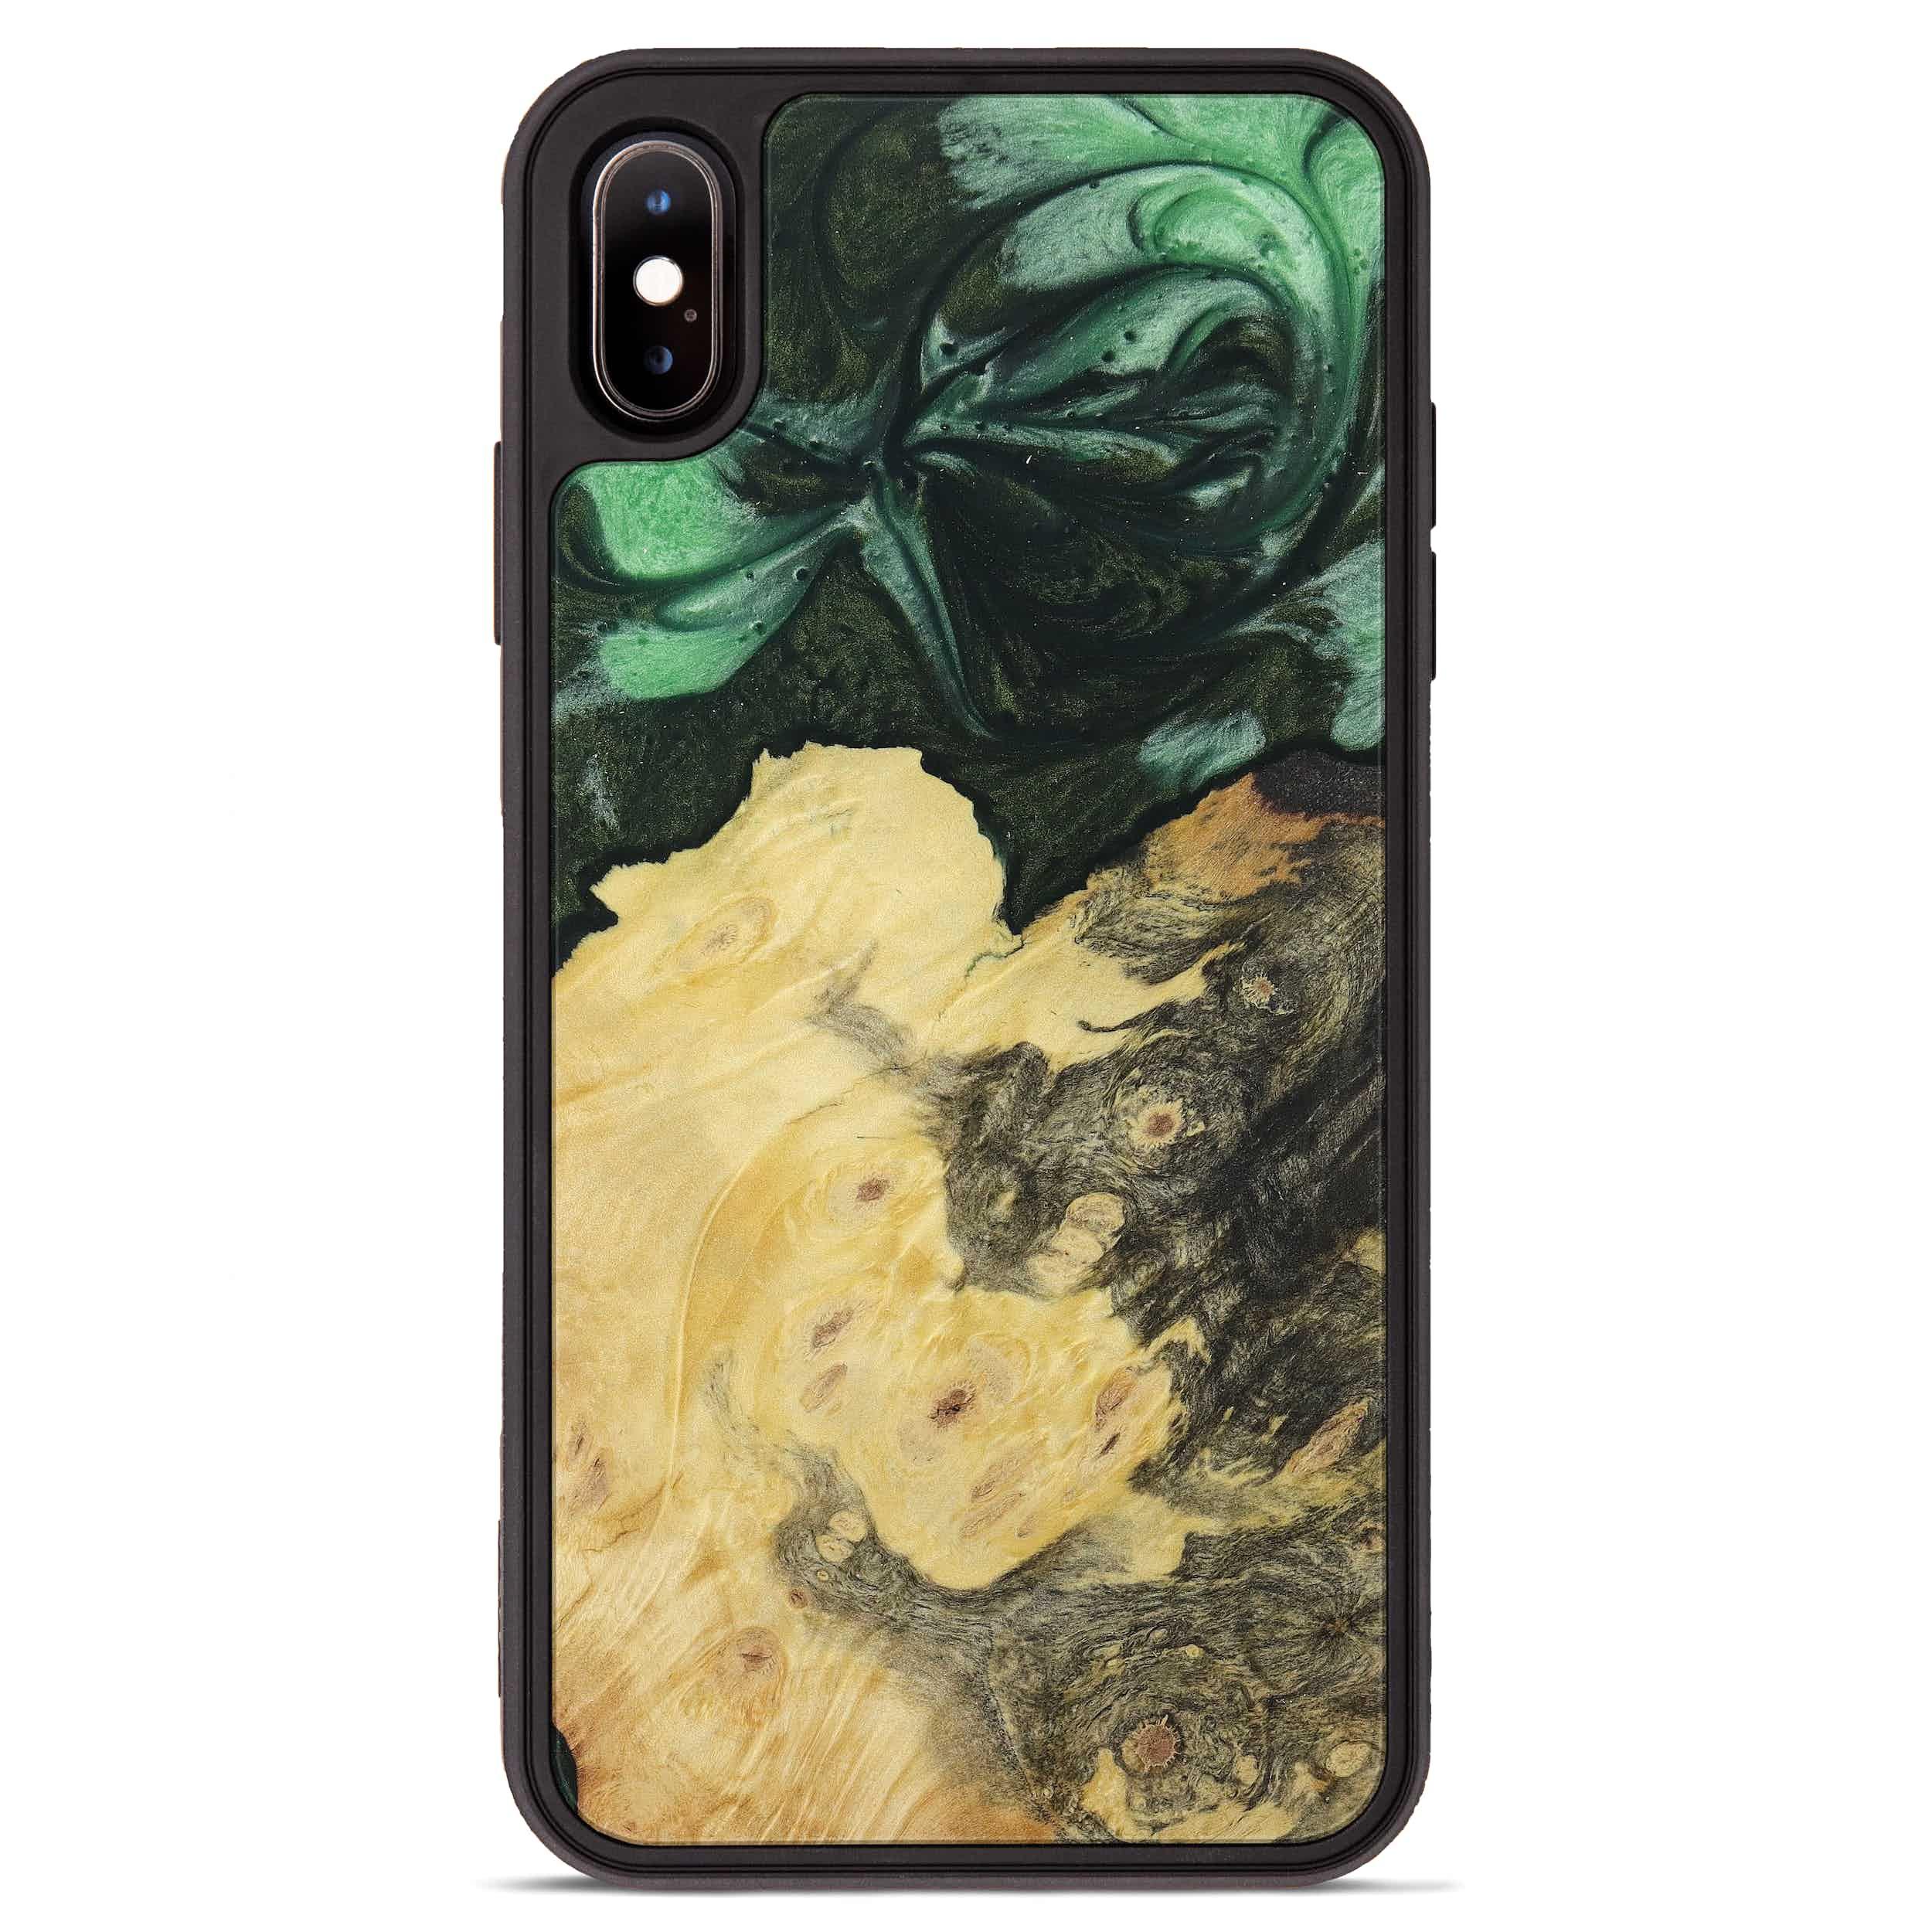 iPhone Xs Max Wood+Resin Phone Case - Pammi (Dark Green, 394616)